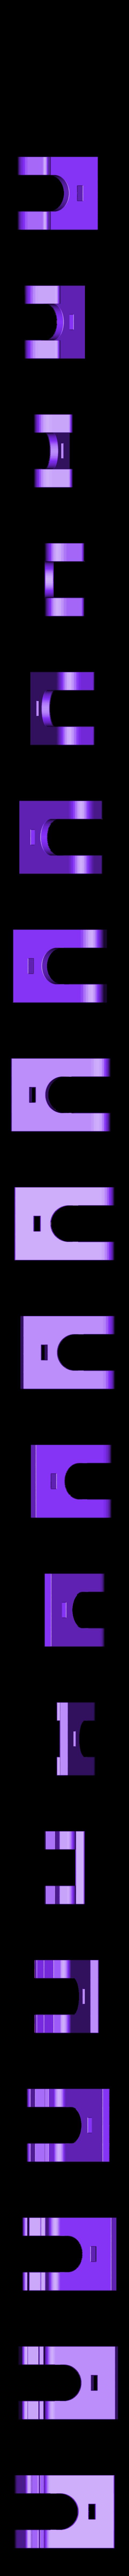 BART.part1.stl Download STL file phone holder bart simpson • Template to 3D print, ernestmocassin